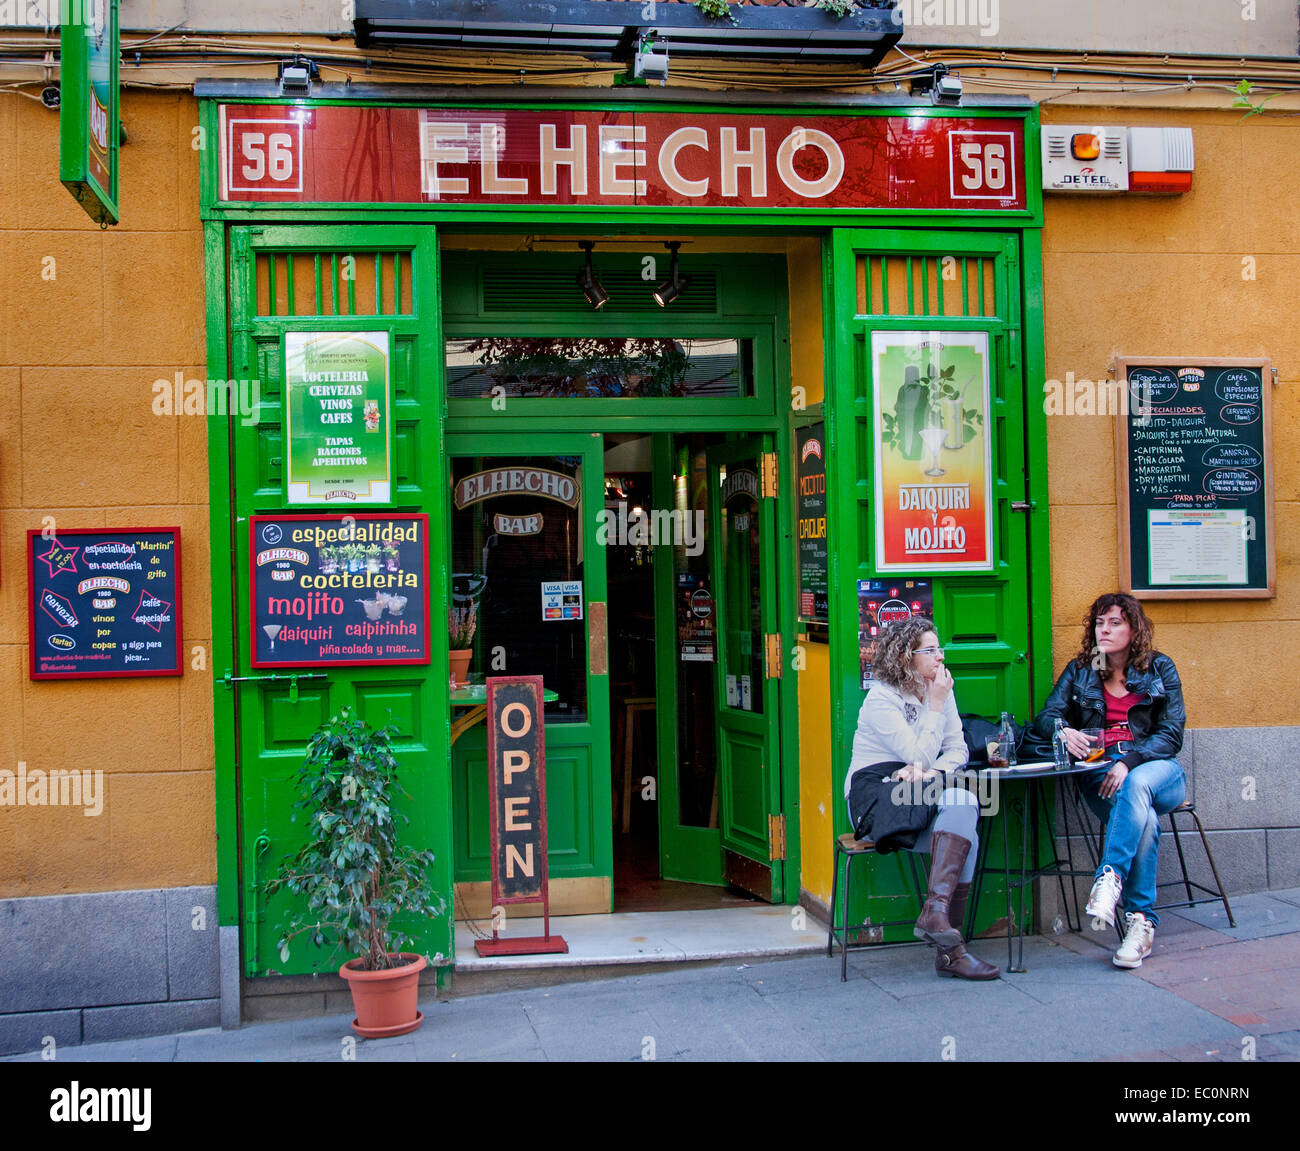 El helco bar pub cafe restaurant madrid two women stock for Cafe el jardin madrid